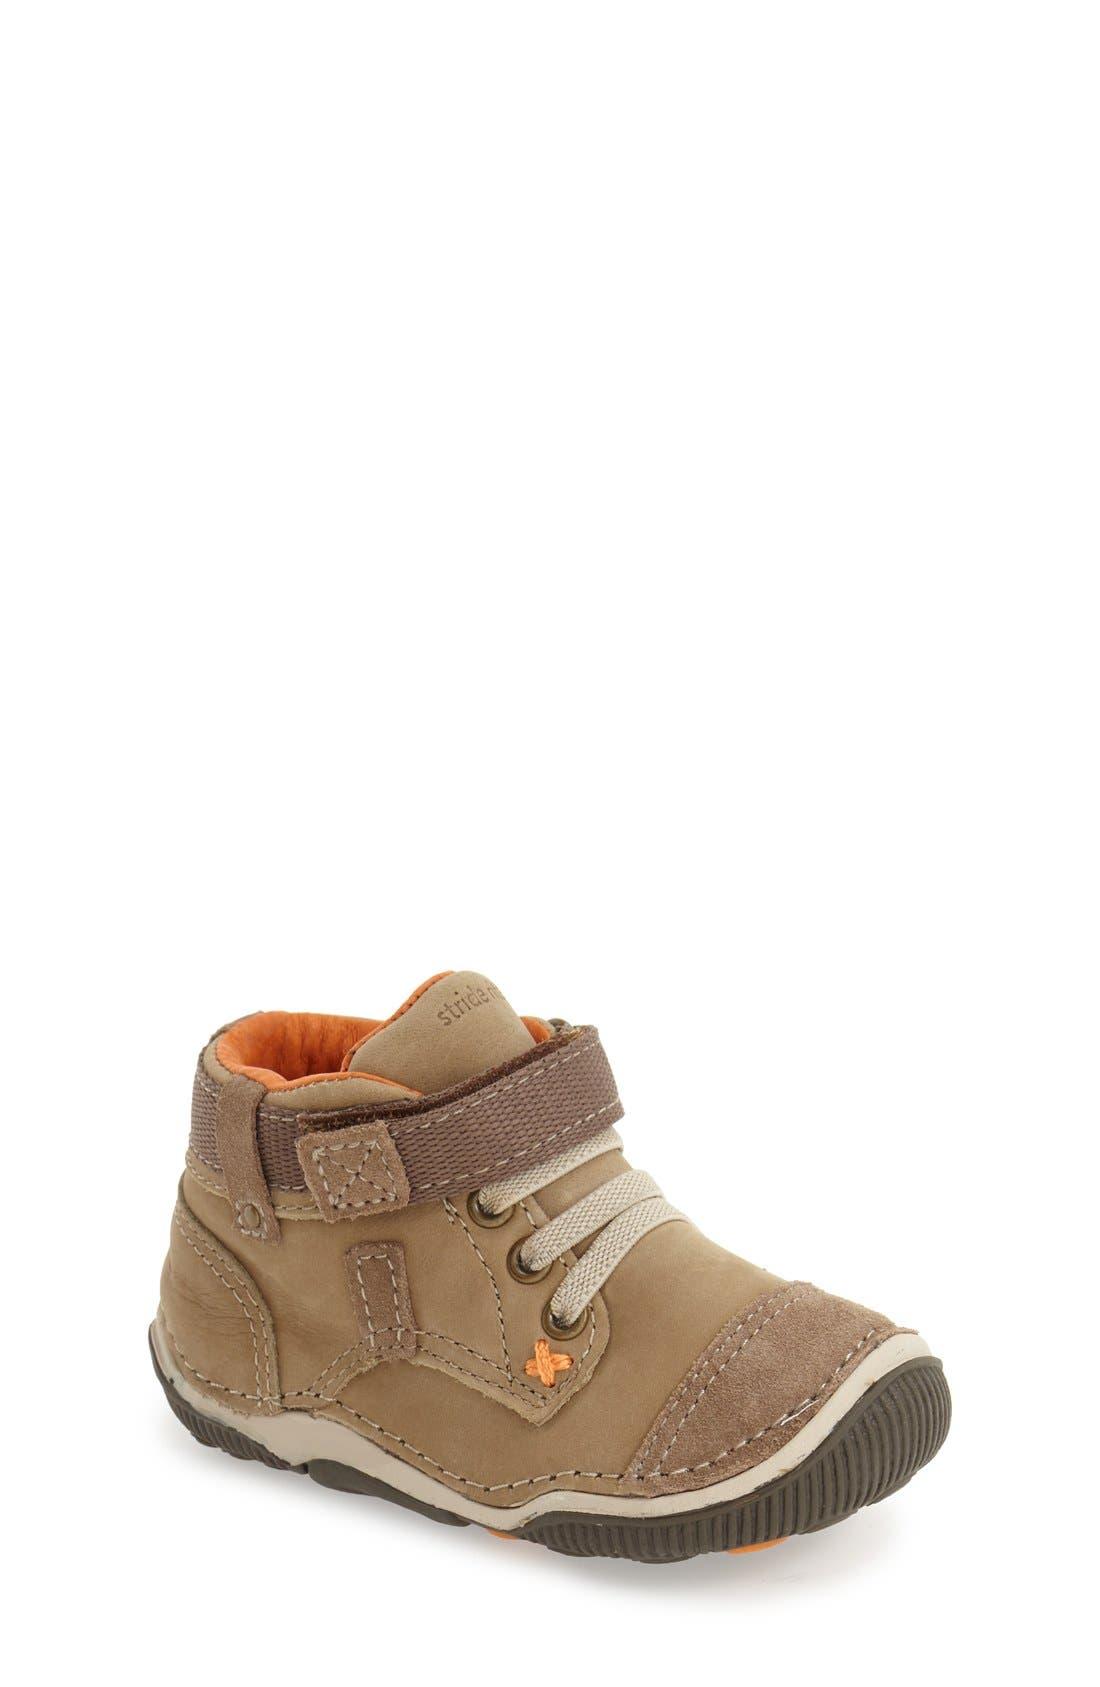 STRIDE RITE, 'Garrett' High Top Bootie Sneaker, Main thumbnail 1, color, BROWN